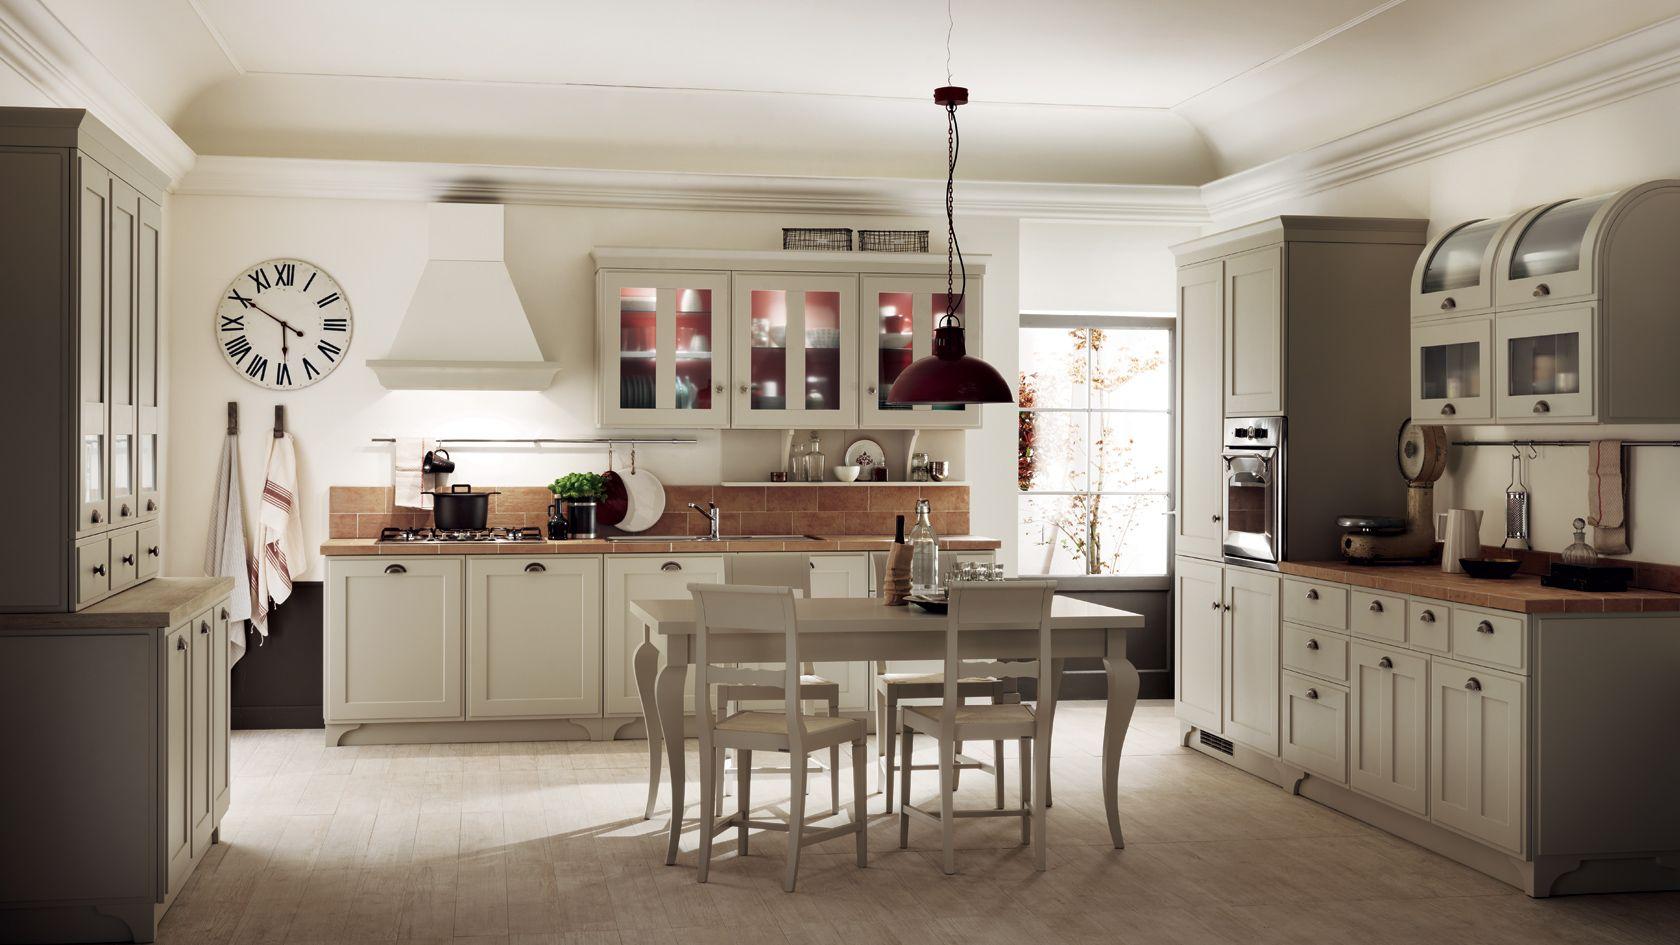 Favilla Scavolini | Idee per la casa | Pinterest | Kitchens ...